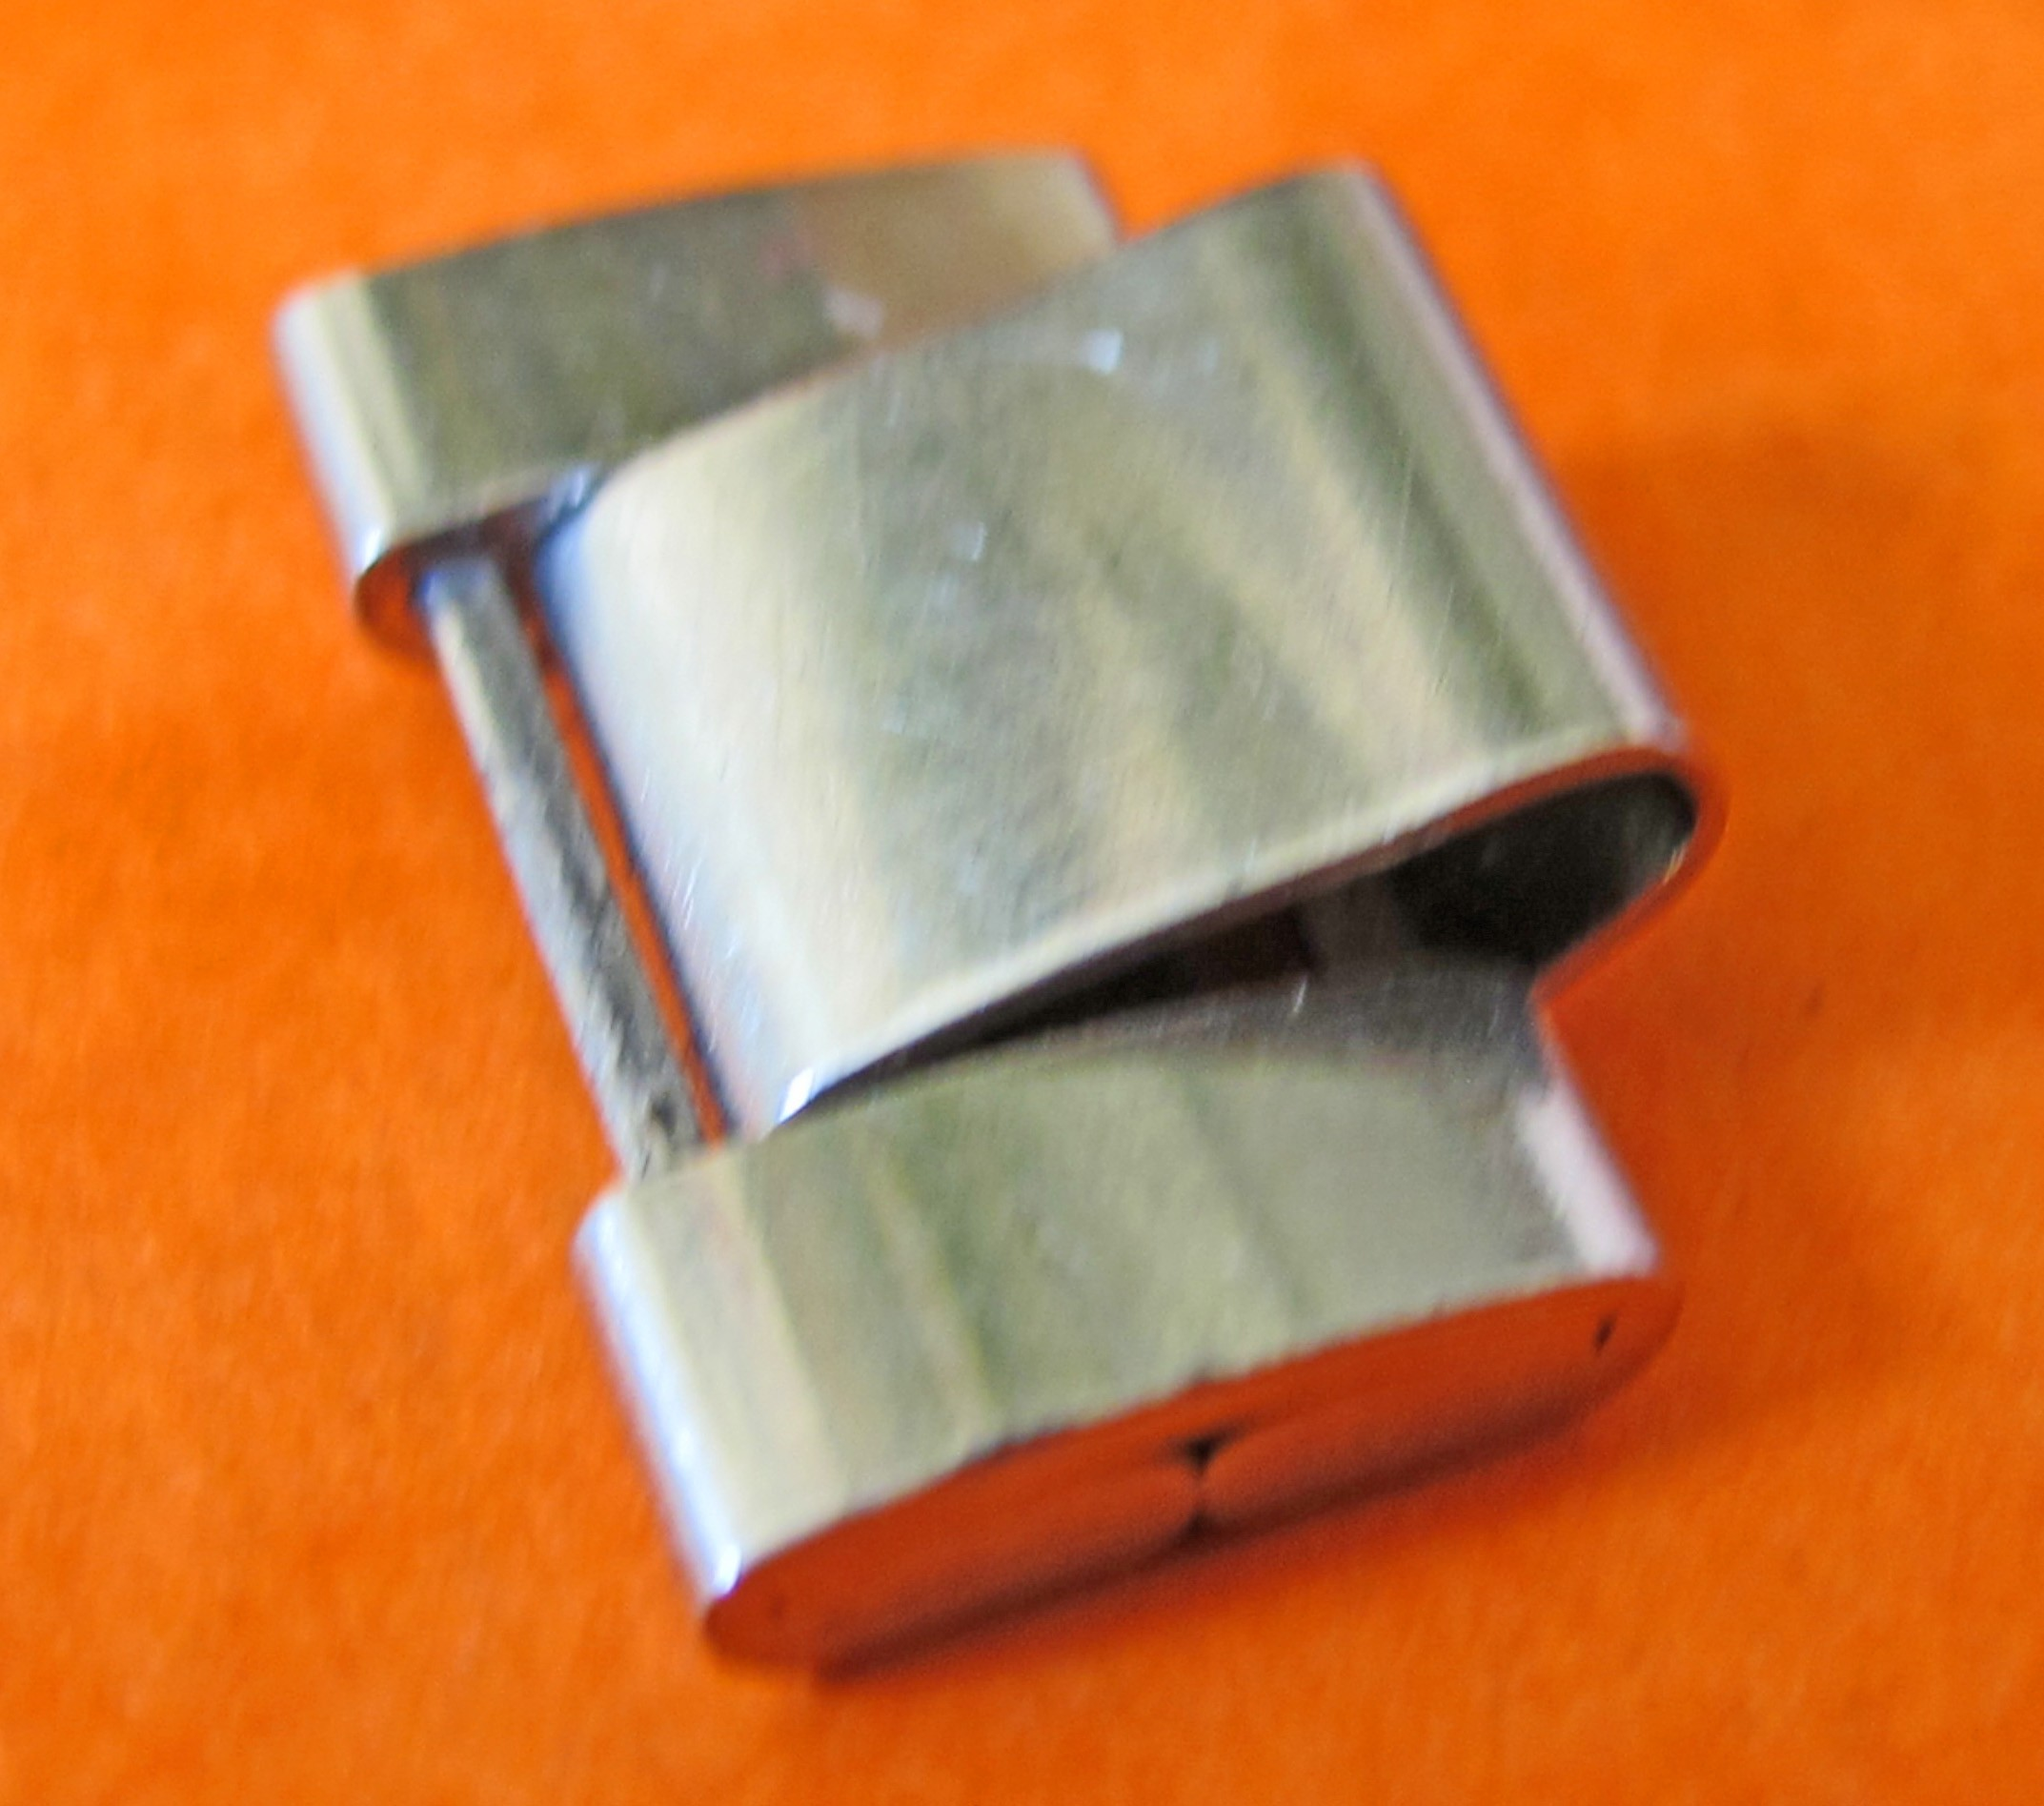 1 ROLEX TUDOR FOLDED LINK 9315 17.96mm